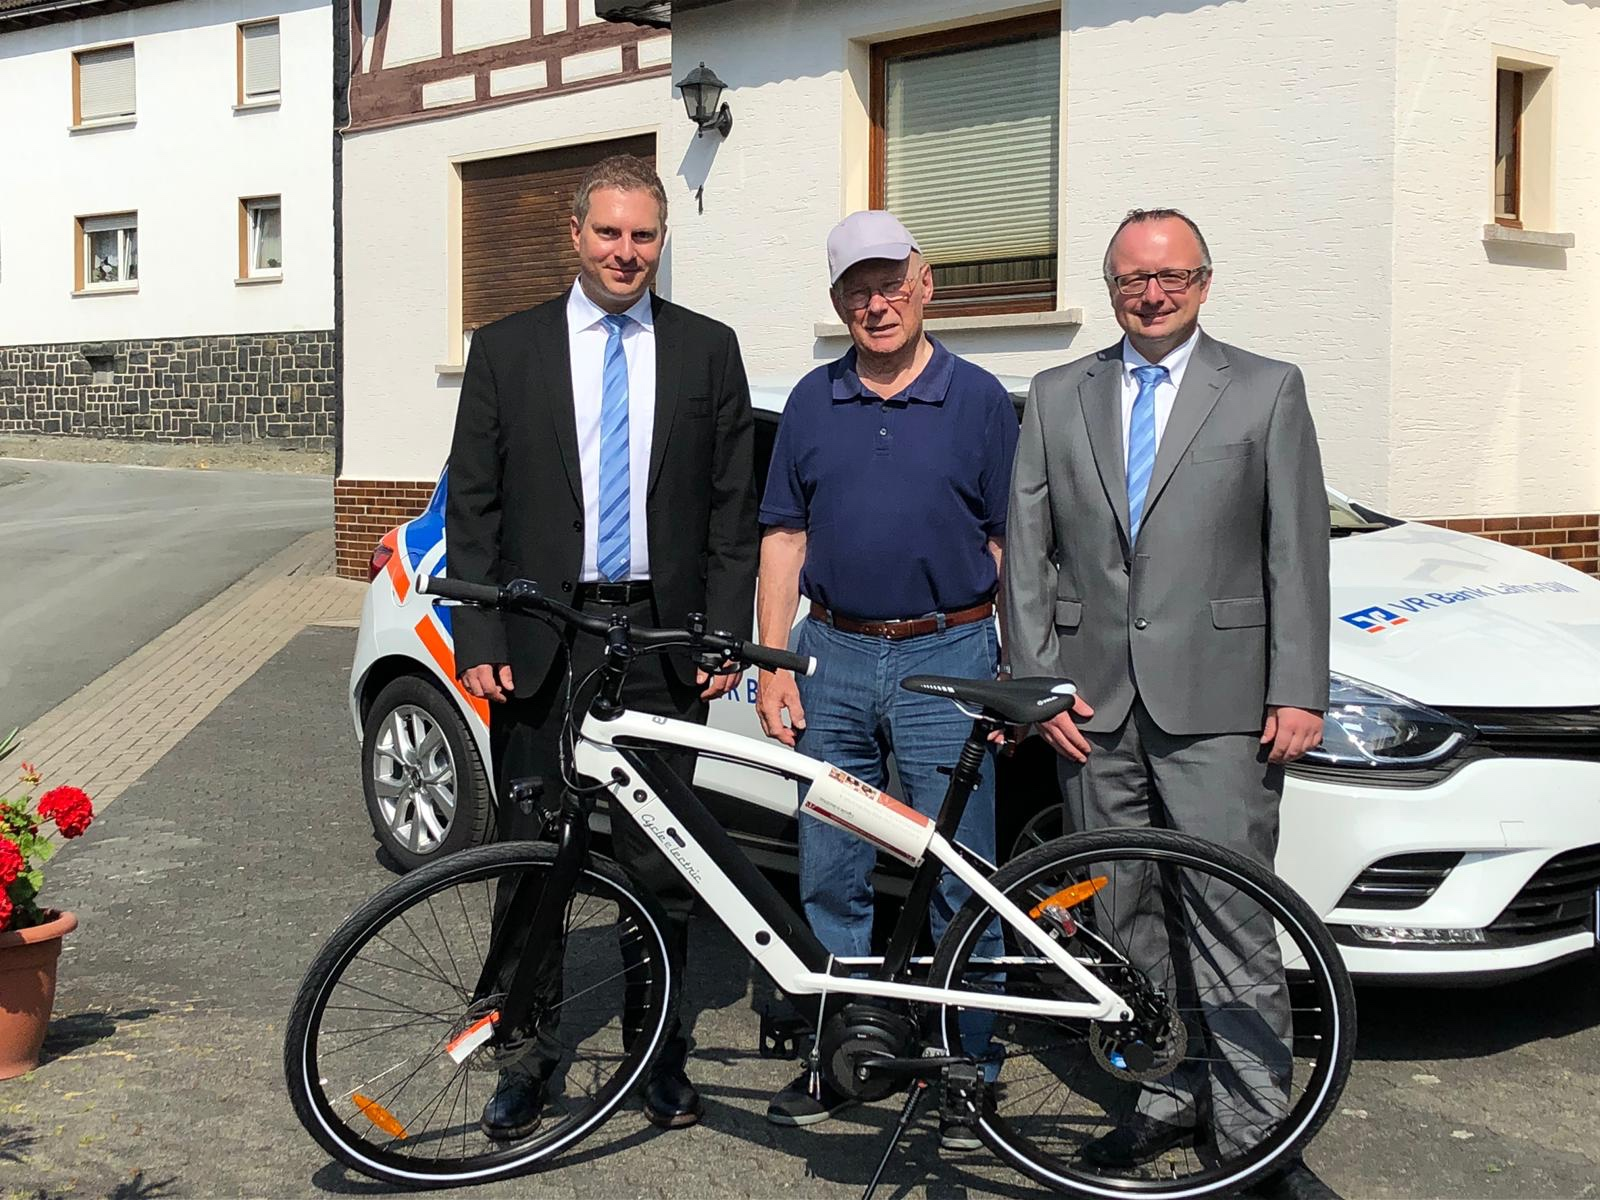 v.l.n.r. Thomas Busch, Horst Grebe, Steven Acker